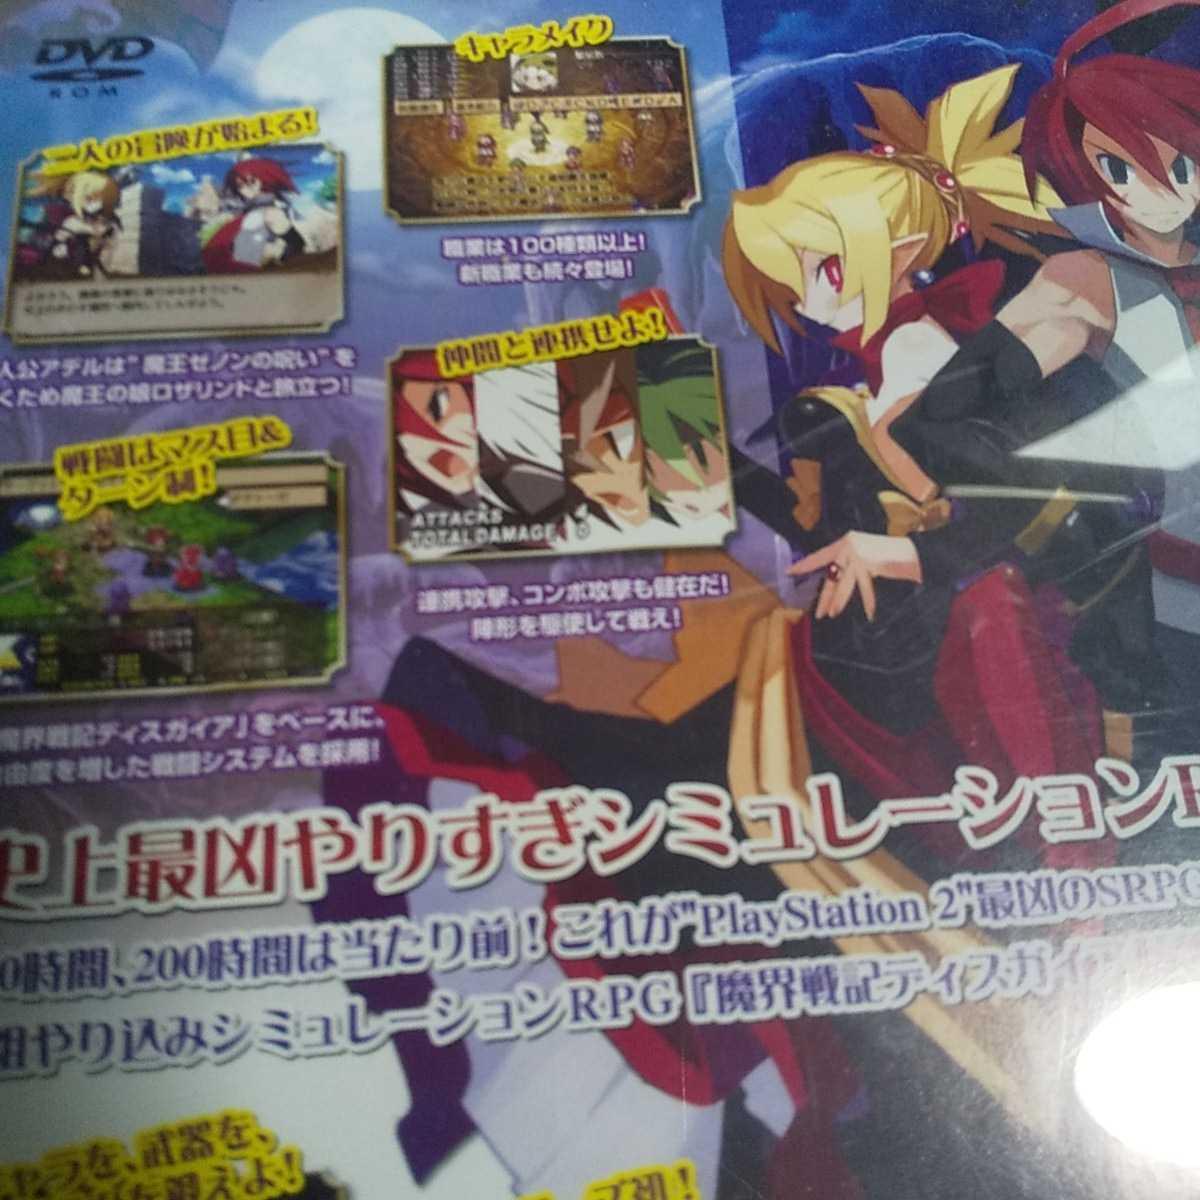 PS2【魔界戦記ディスガイア2】日本一ソフトウェア [送料無料]返金保証あり